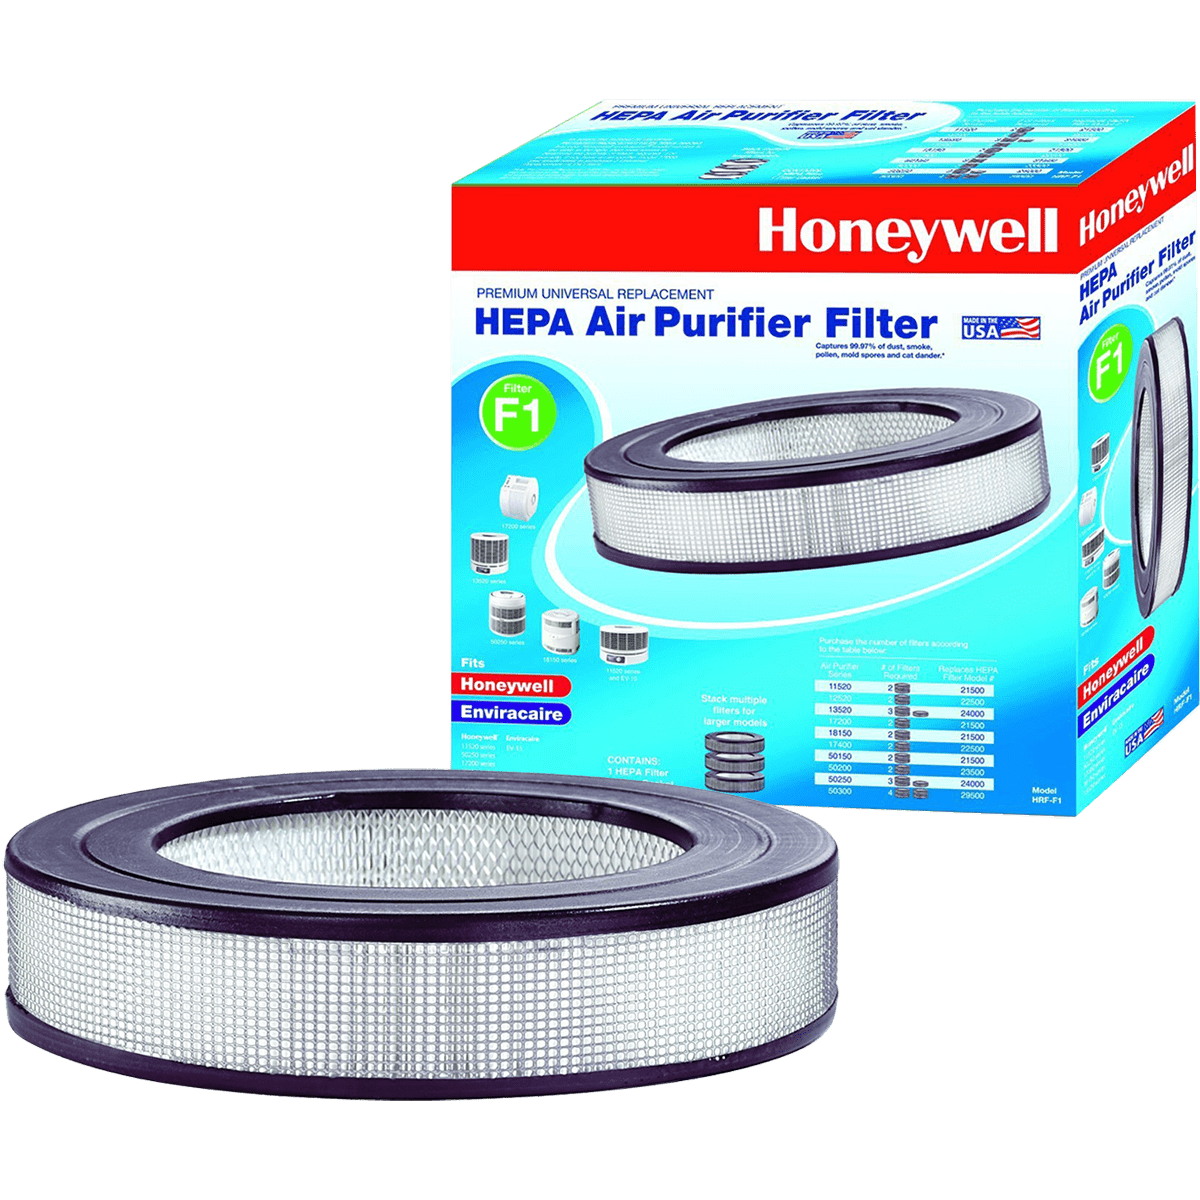 Honeywell HRF-F1 Universal HEPA Filter ho2467